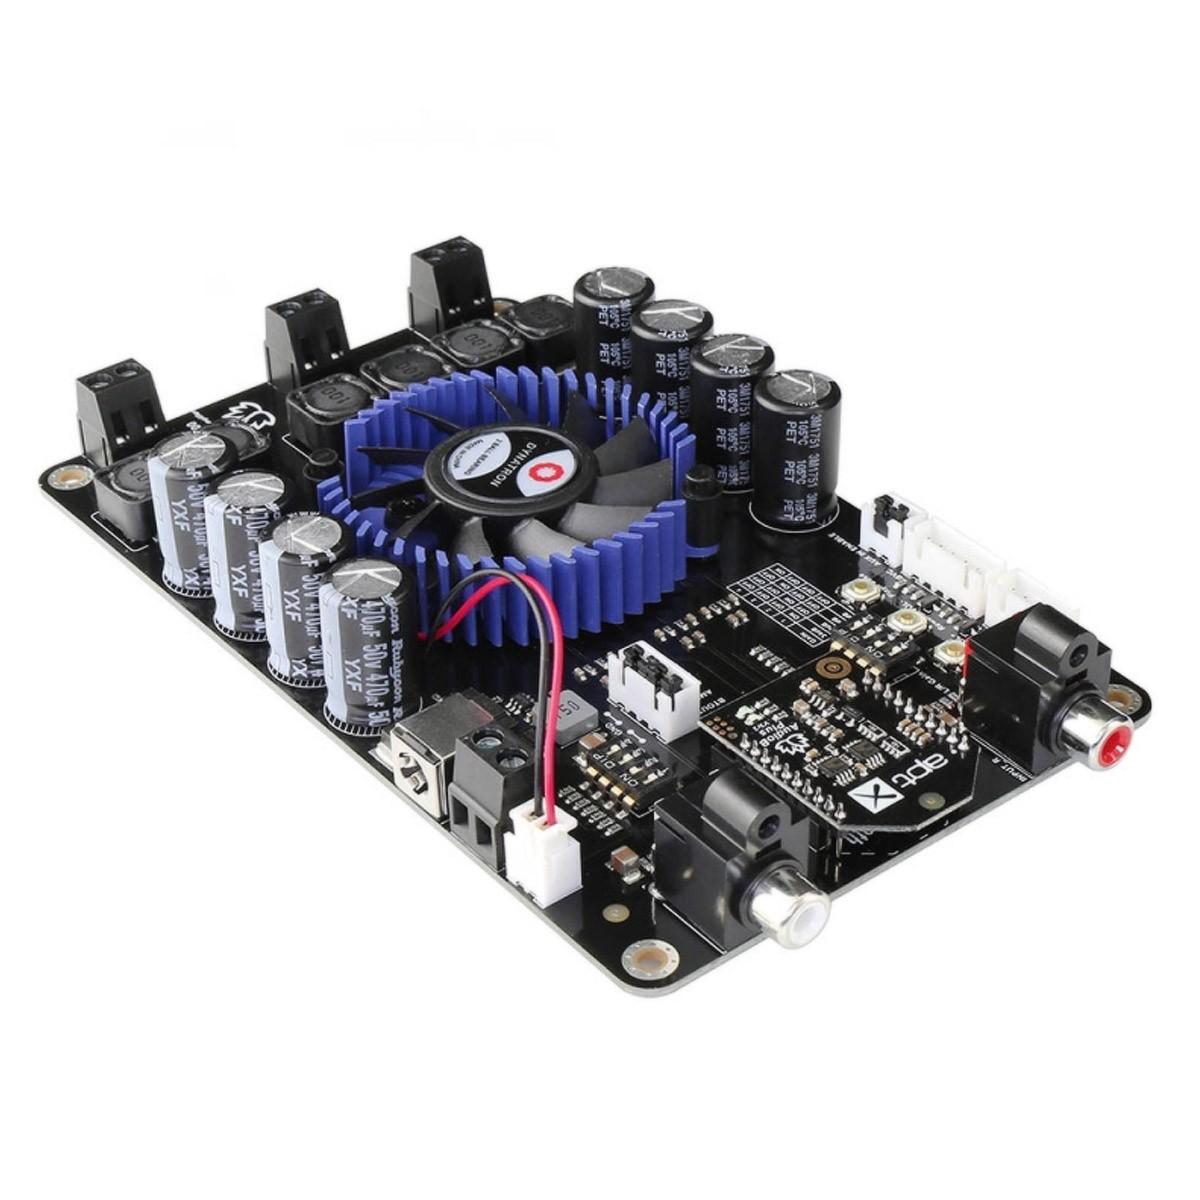 TINYSINE TSA7500B Module Amplificateur 2.1 TPA3221 Bluetooth aptX 2x100W + 200W